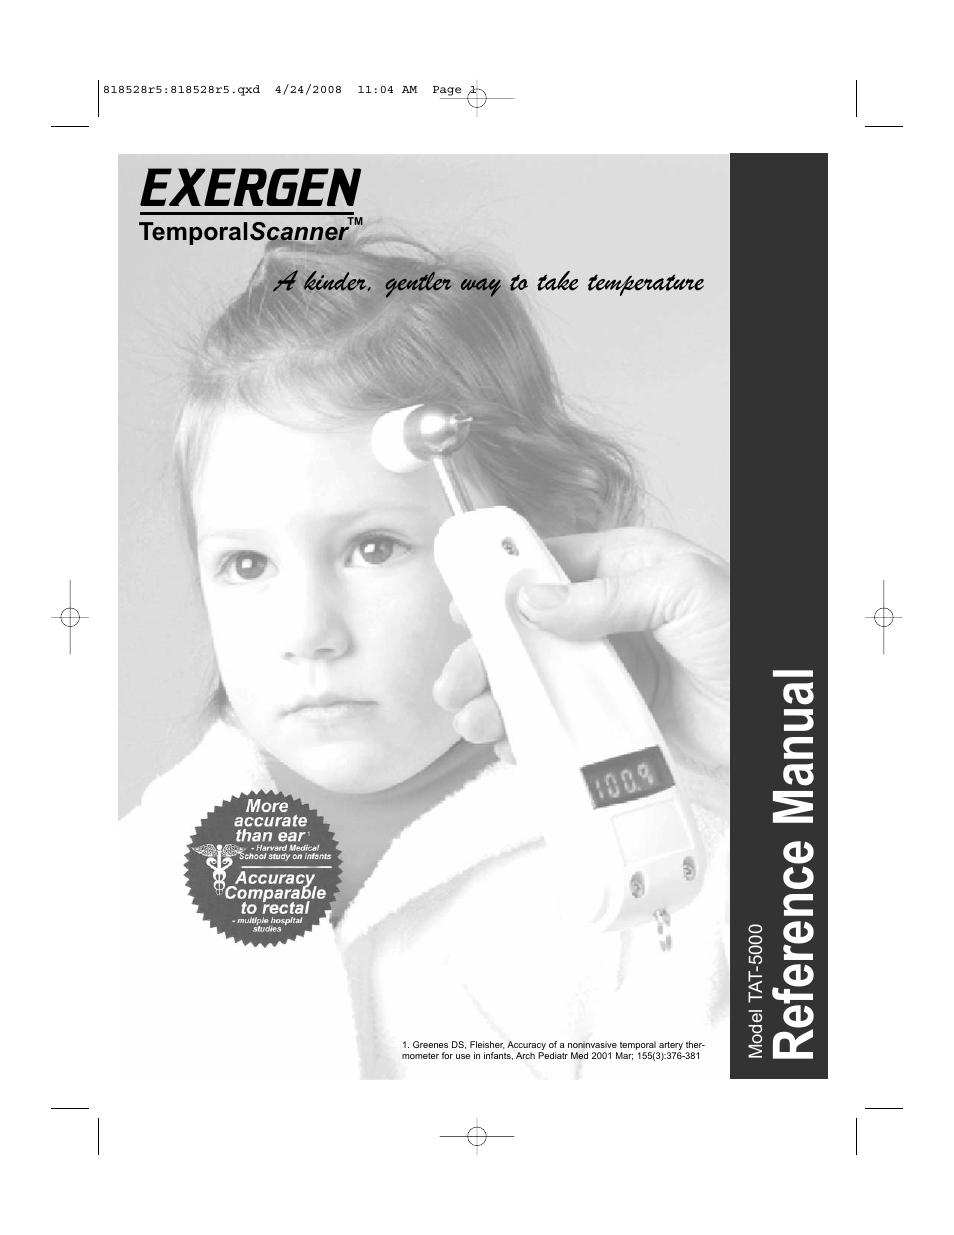 Exergen Temporalscanner Tat Manual Guide